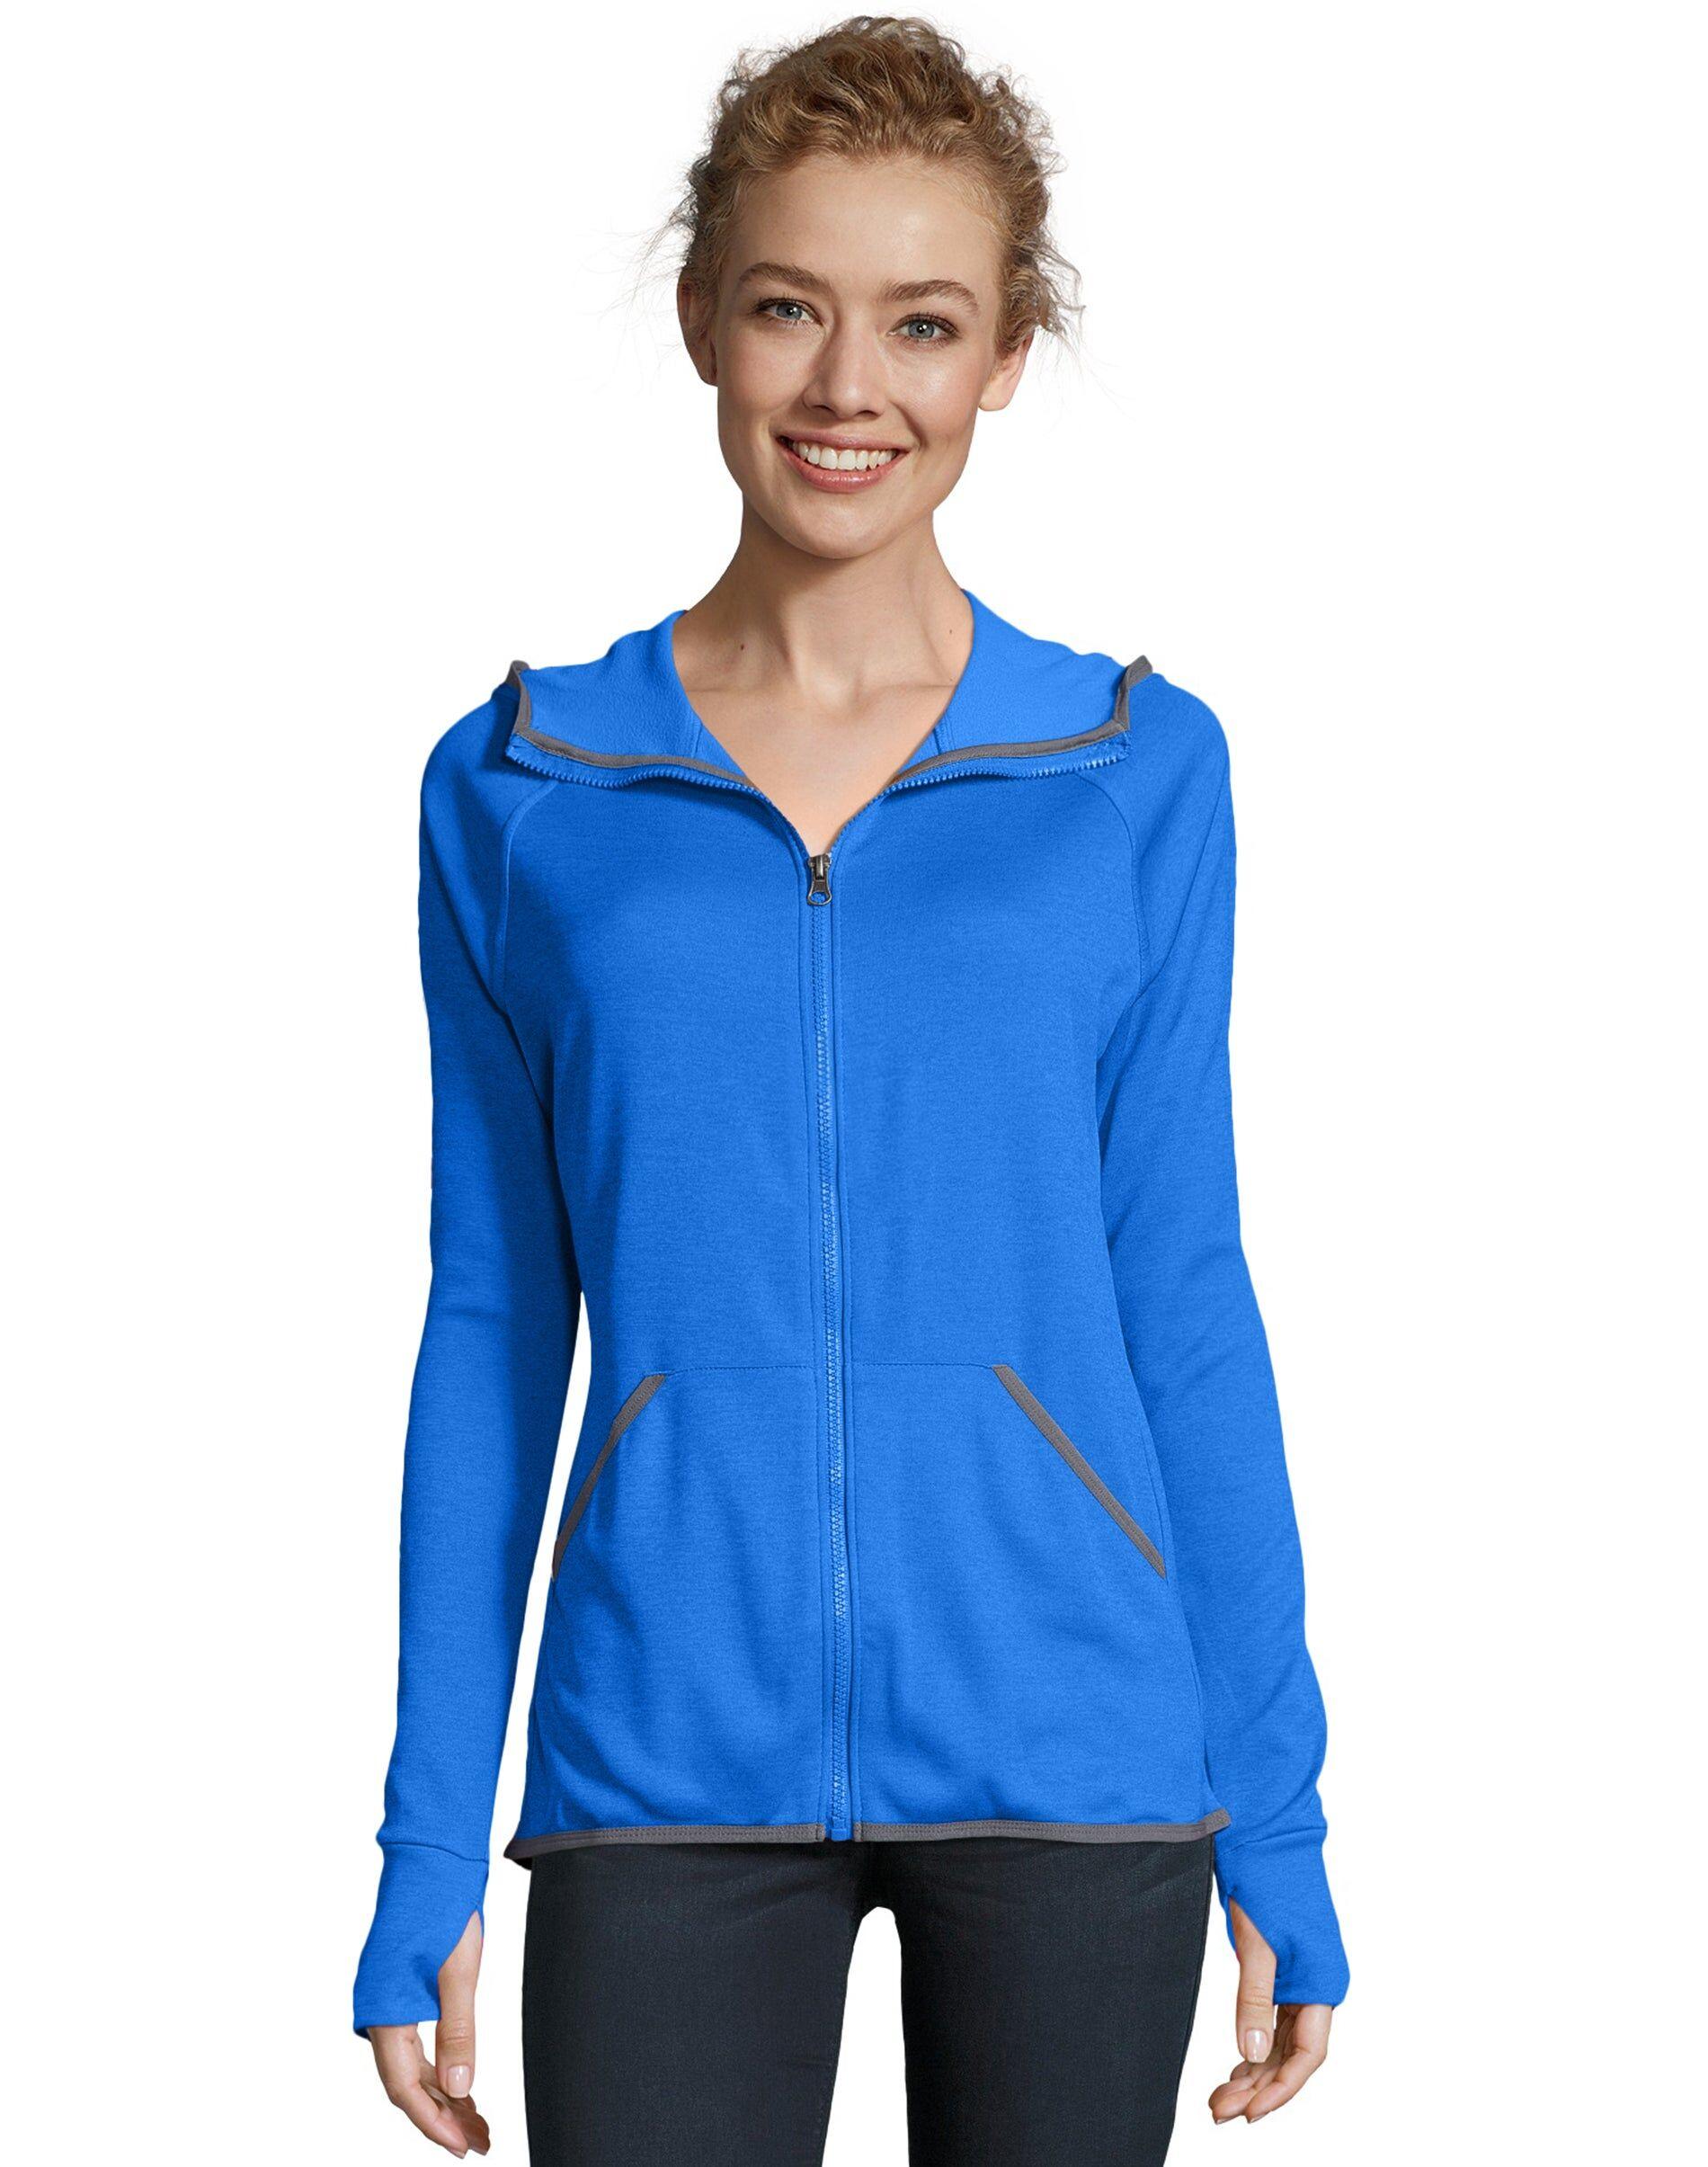 Hanes Sport Women's Performance Fleece Zip Up Hoodie Awesome Blue Heather S